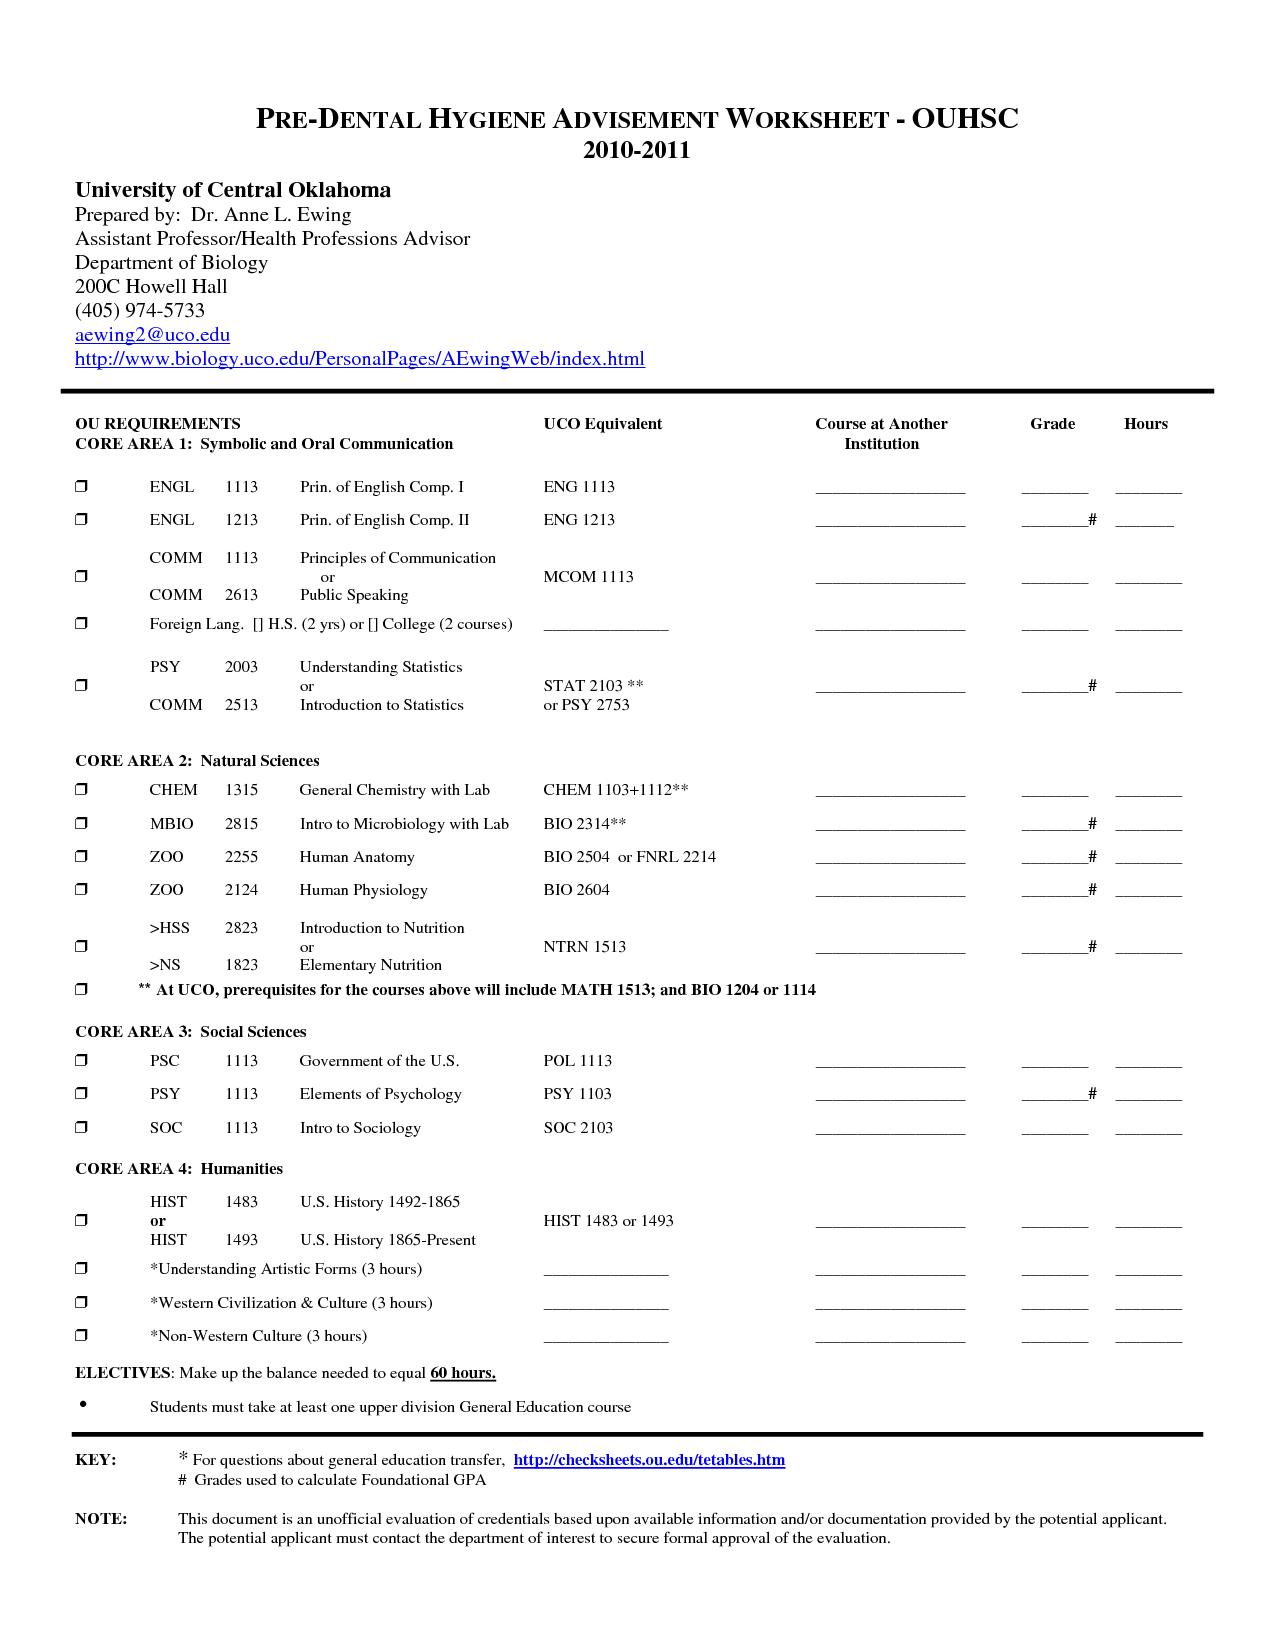 Dental Treatment Planning Worksheet